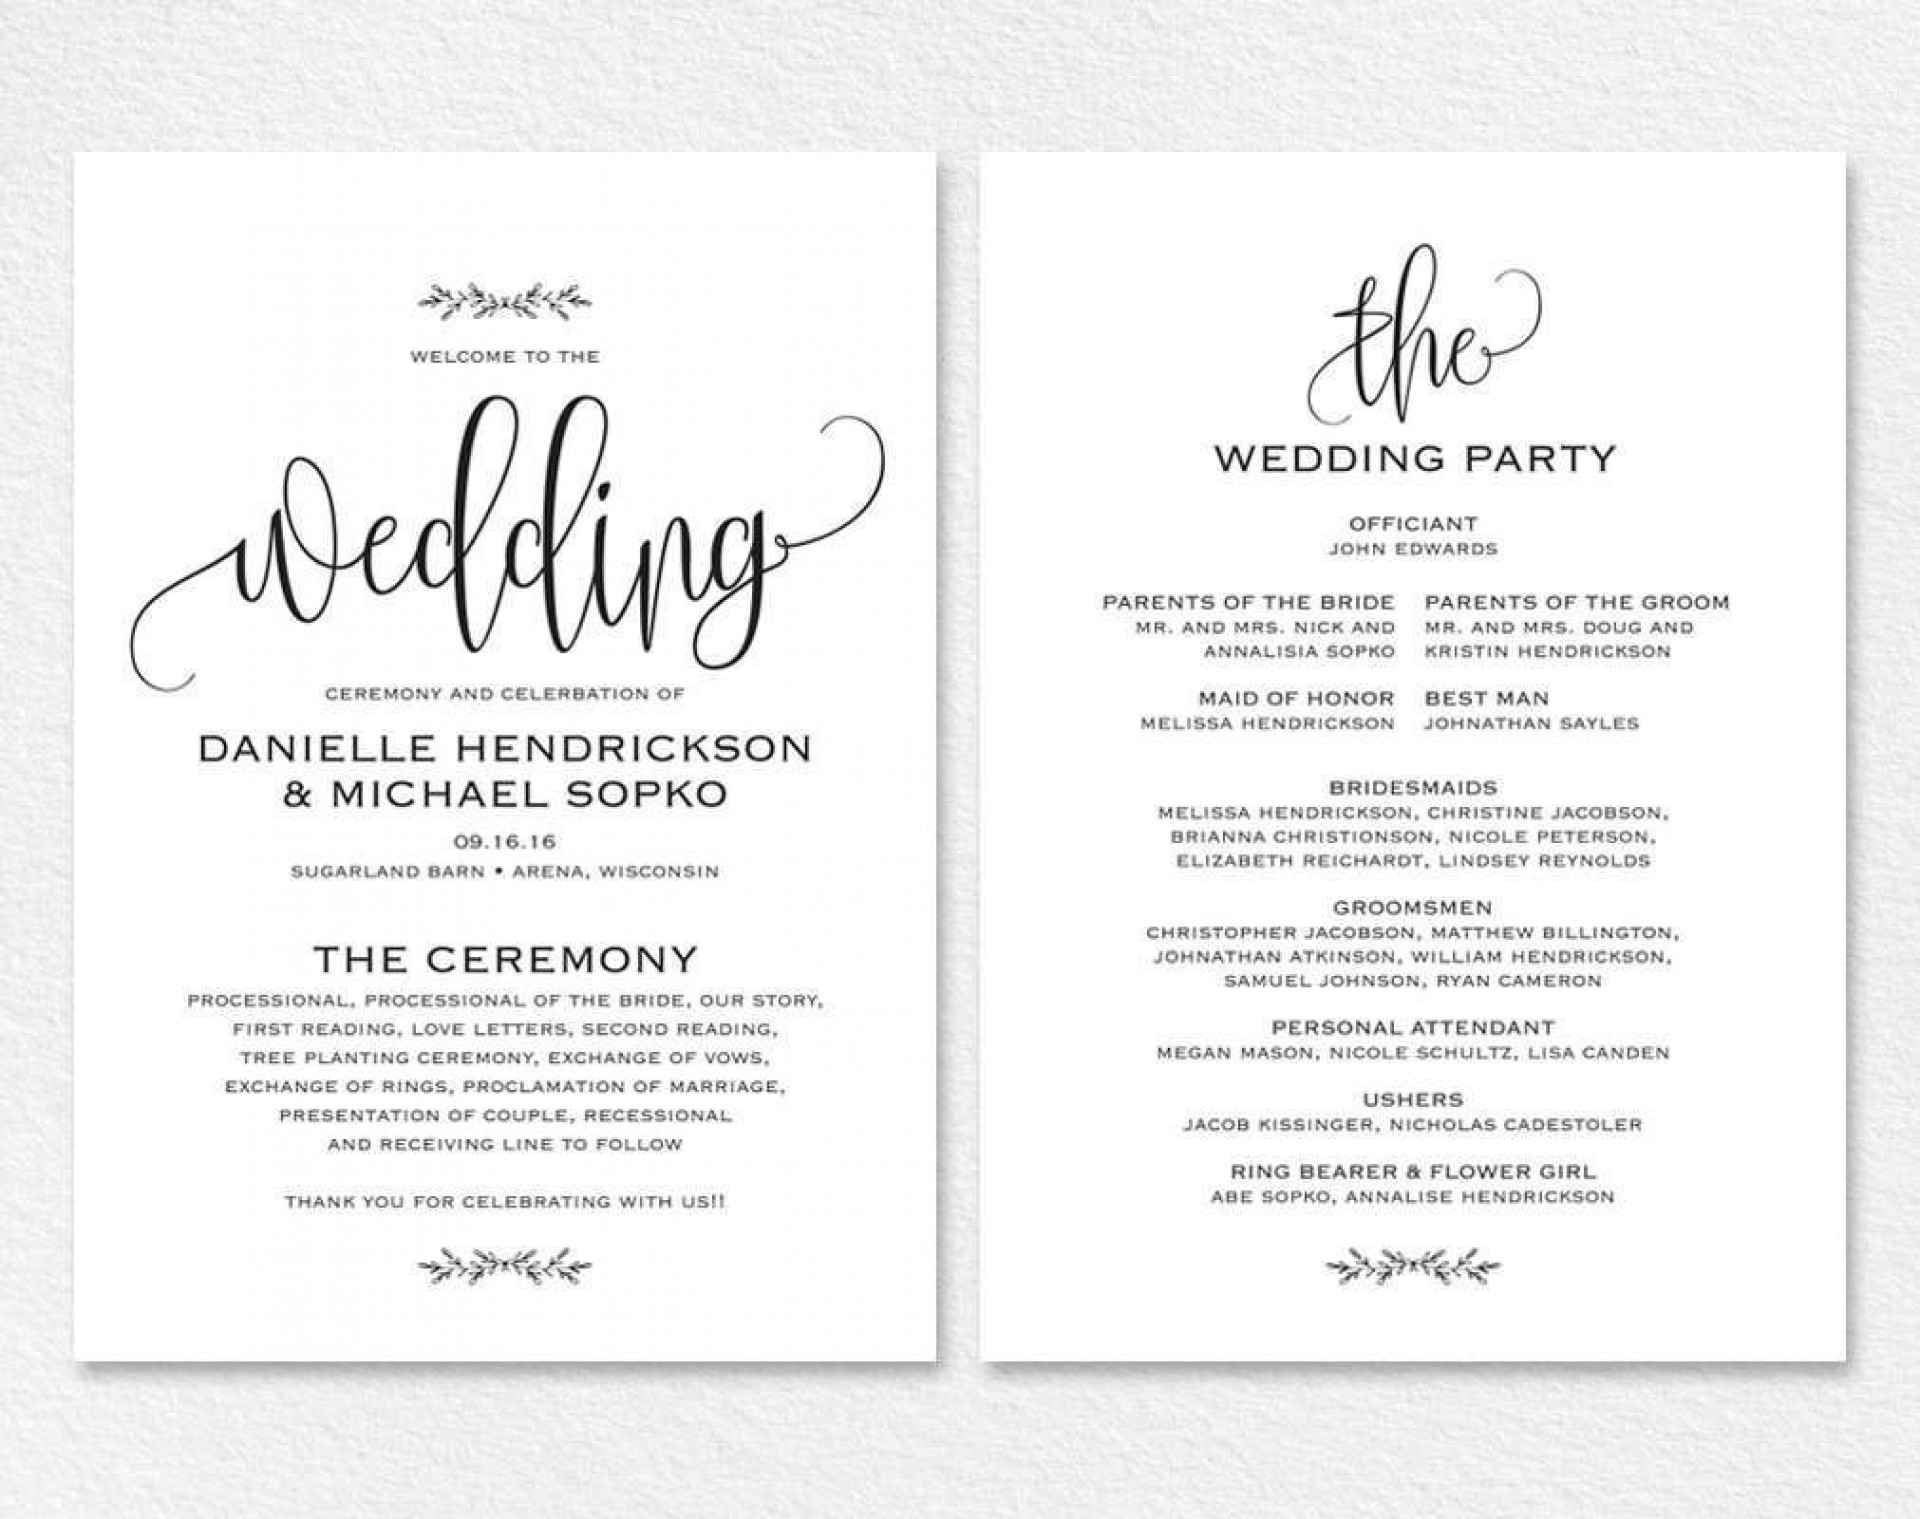 000 Phenomenal Free Word Template For Wedding Program Image  Programs1920